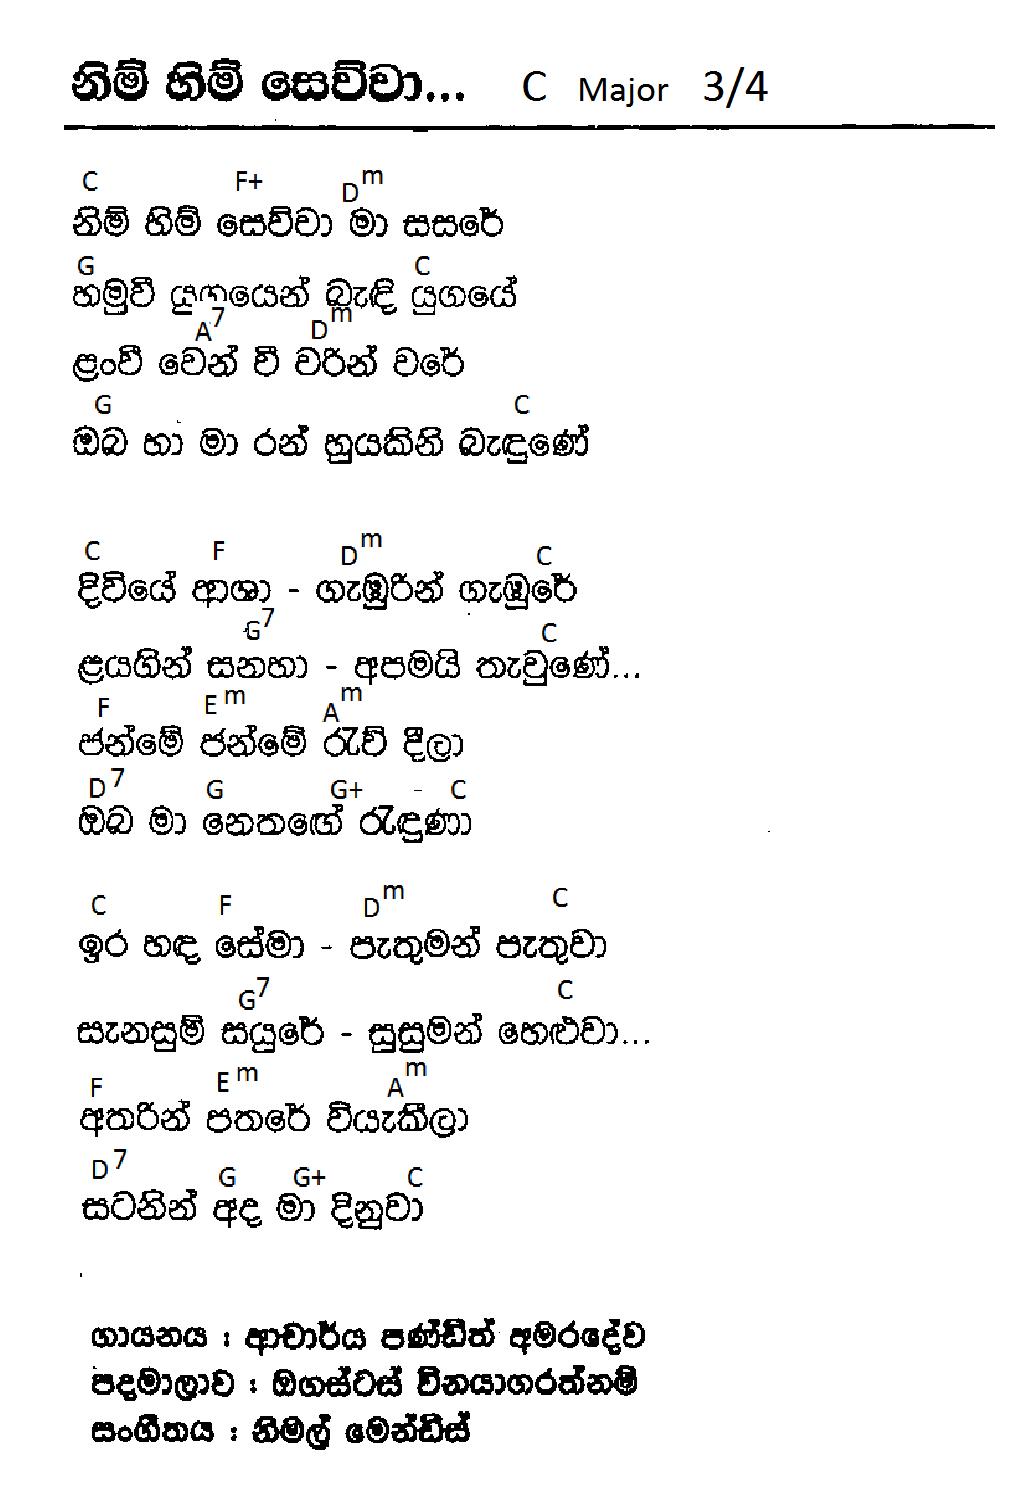 Sinhala Songs Lyrics With Music Chords